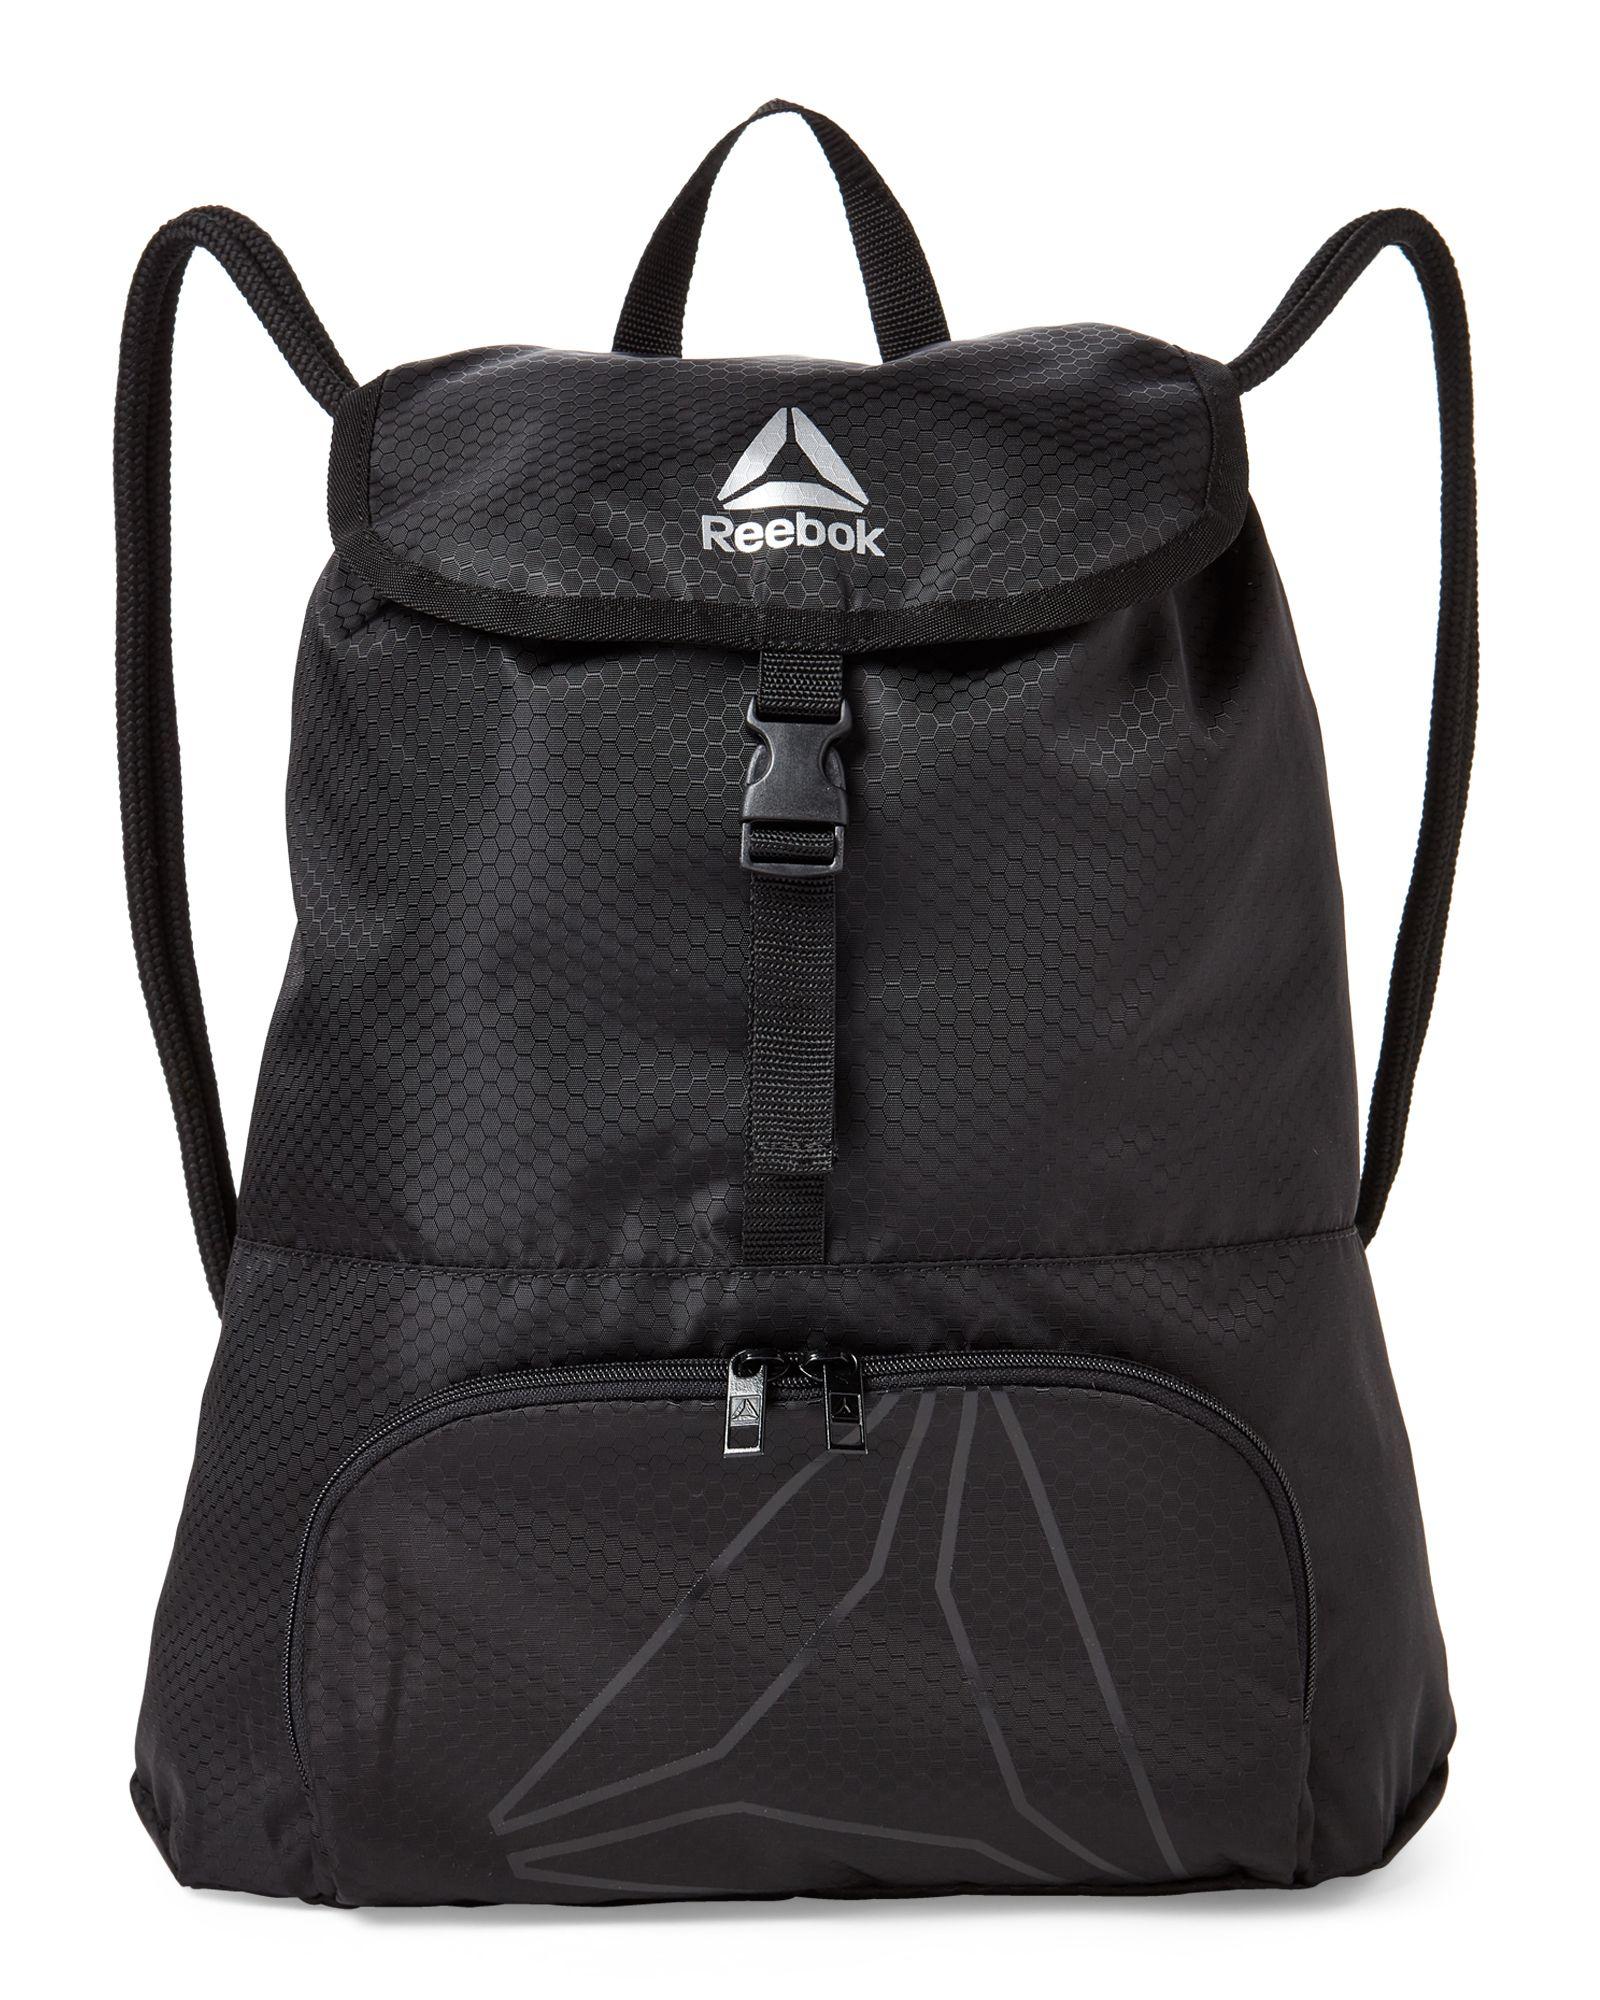 69921145cb33 Reebok Black Mica Drawstring Backpack